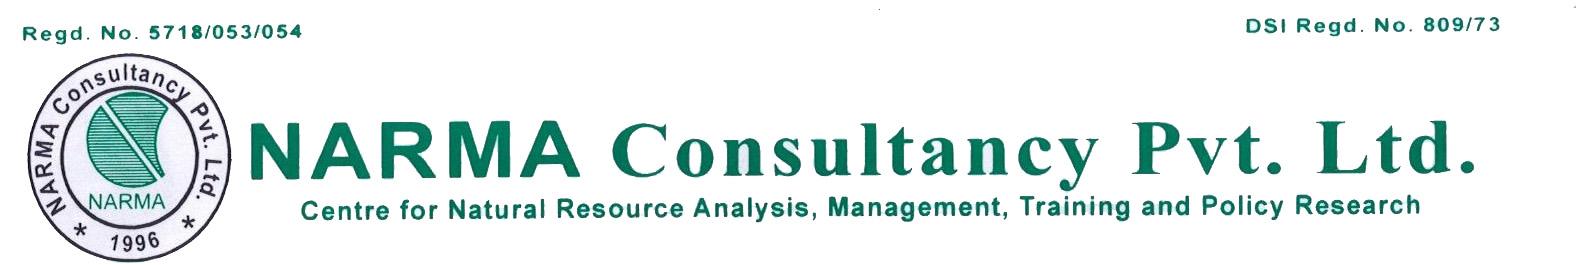 Narma Consultancy Pvt. Ltd.